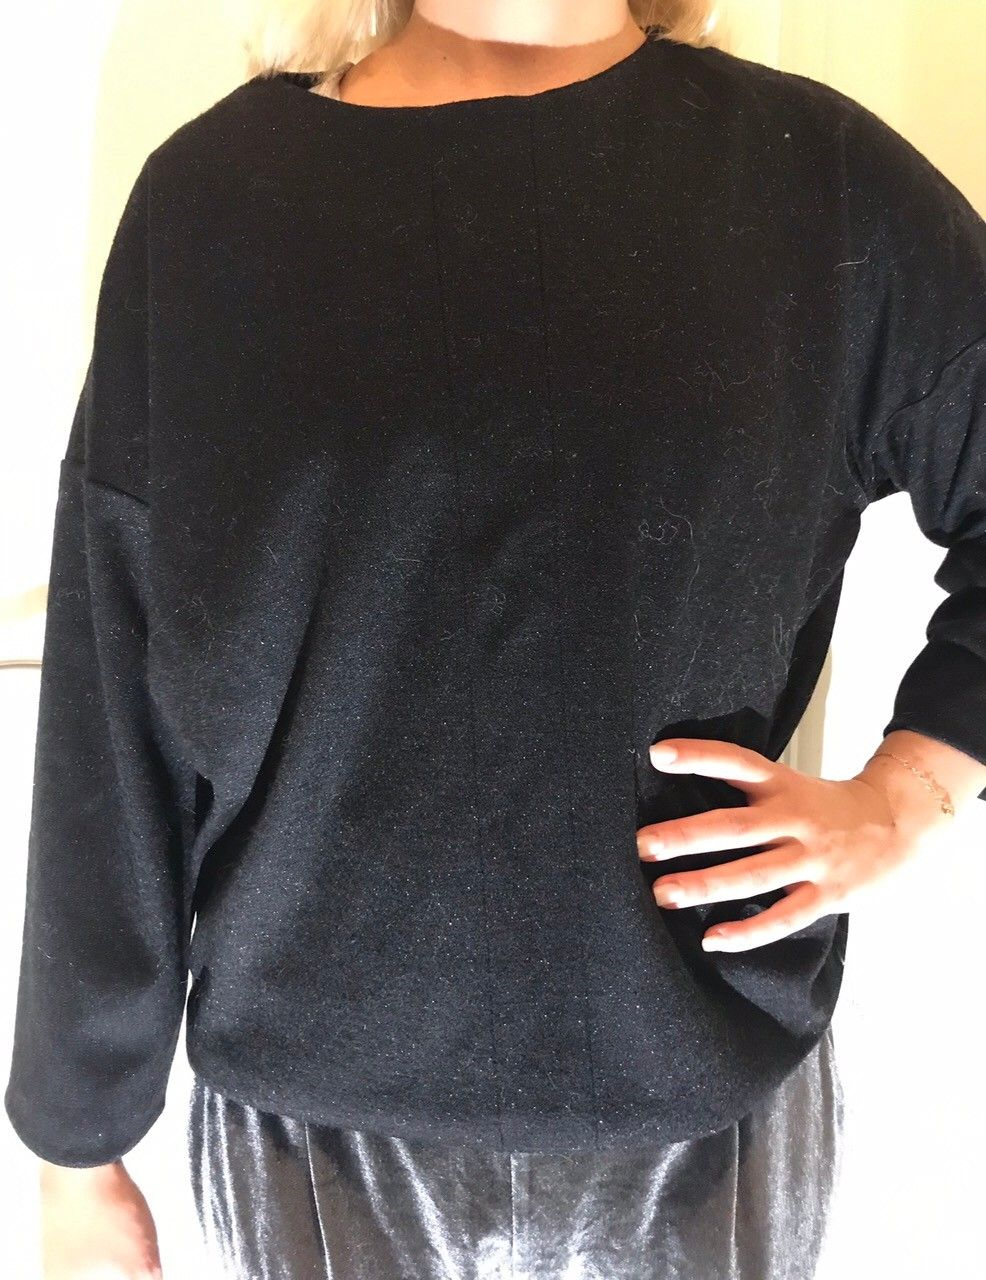 Enkel svart genser selges billig! | FINN.no